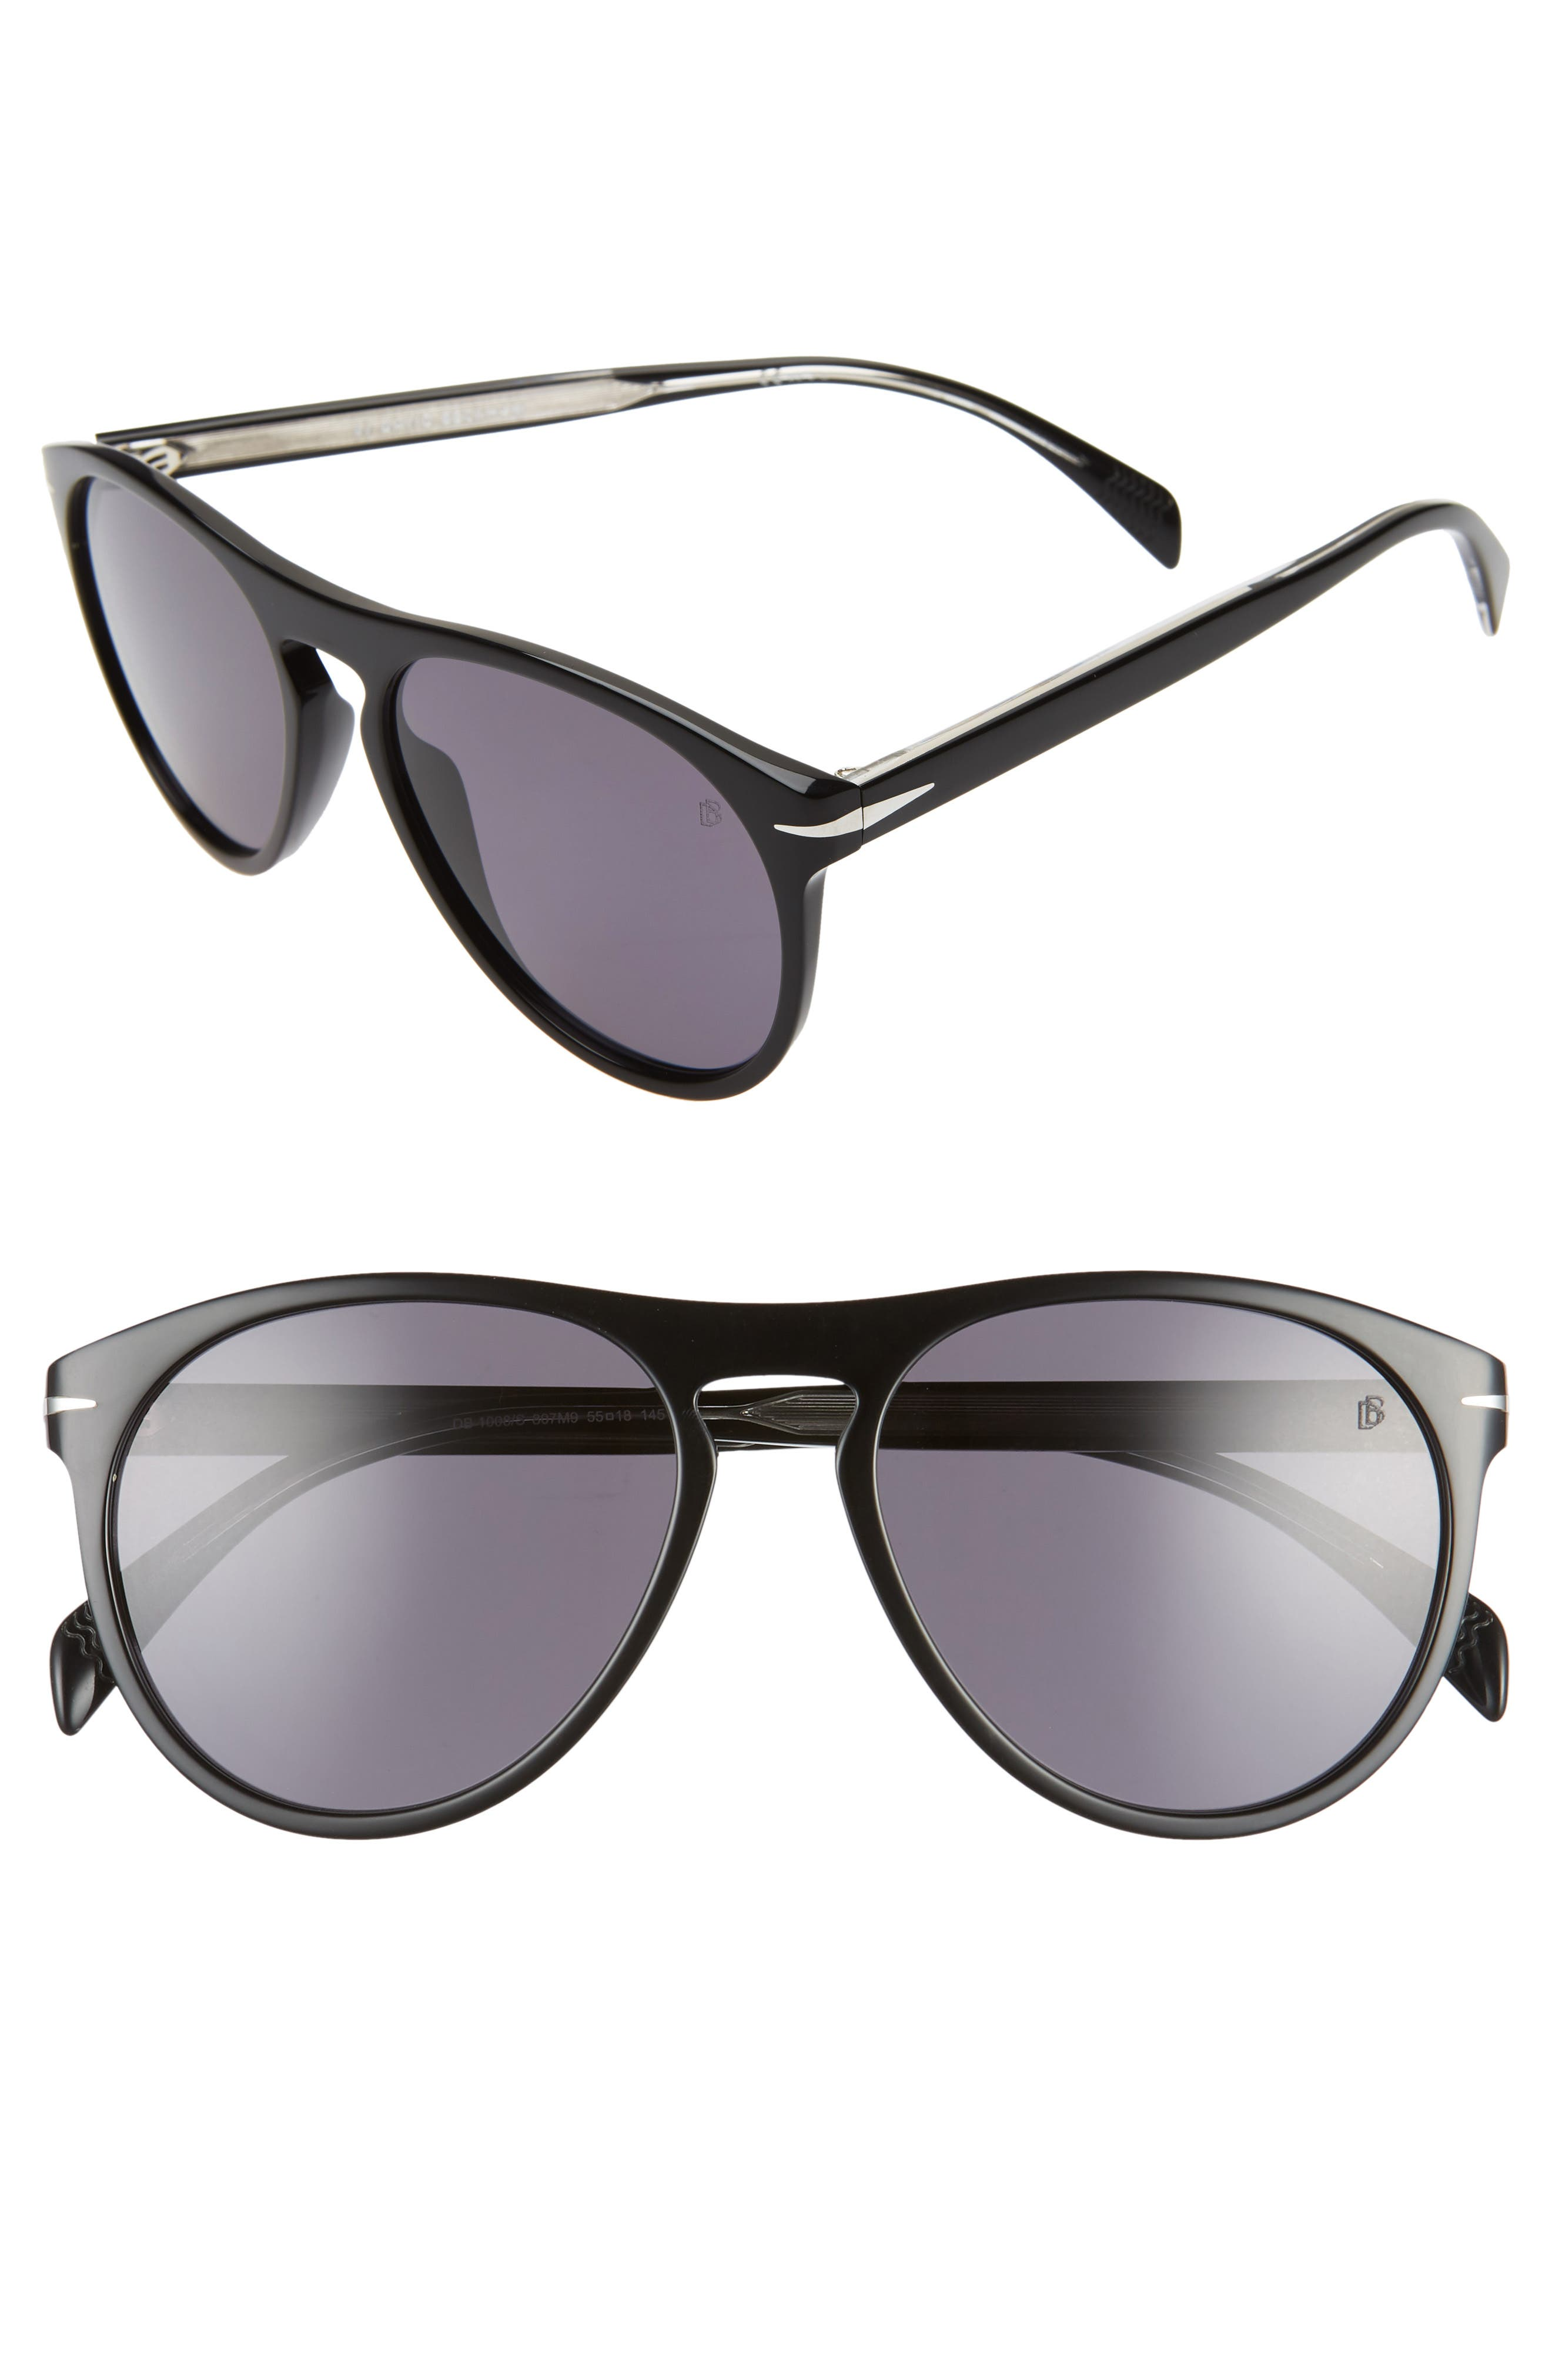 Men's Eyewear By David Beckham Db1008/s 55mm Round Keyhole Sunglasses